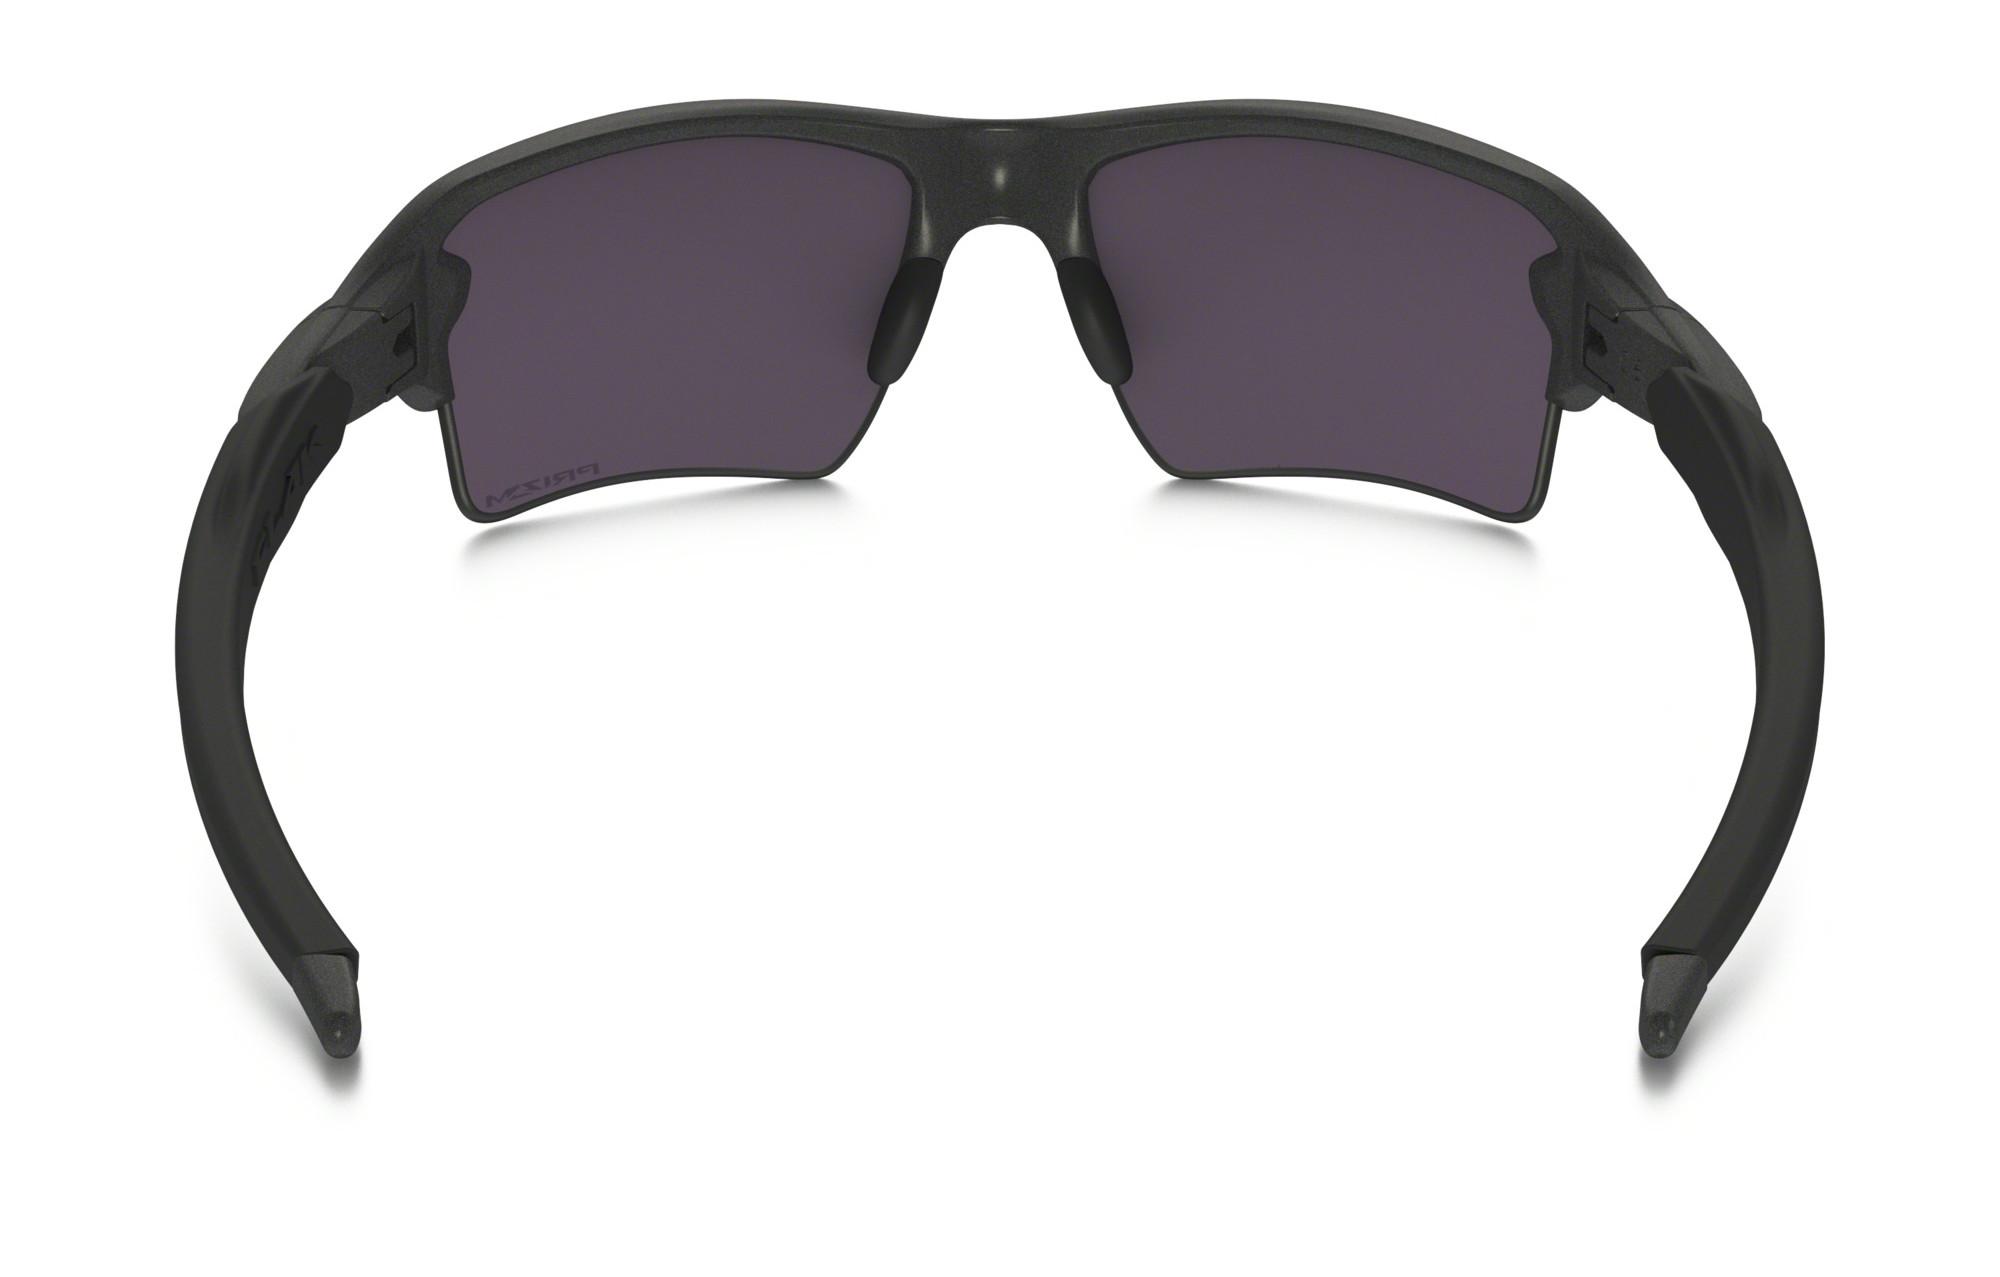 46343a3dcc4 OAKLEY FLAK 2.0 XL Sunglasses Black - Grey Prizm Daily Polarized Ref  OO9188-60